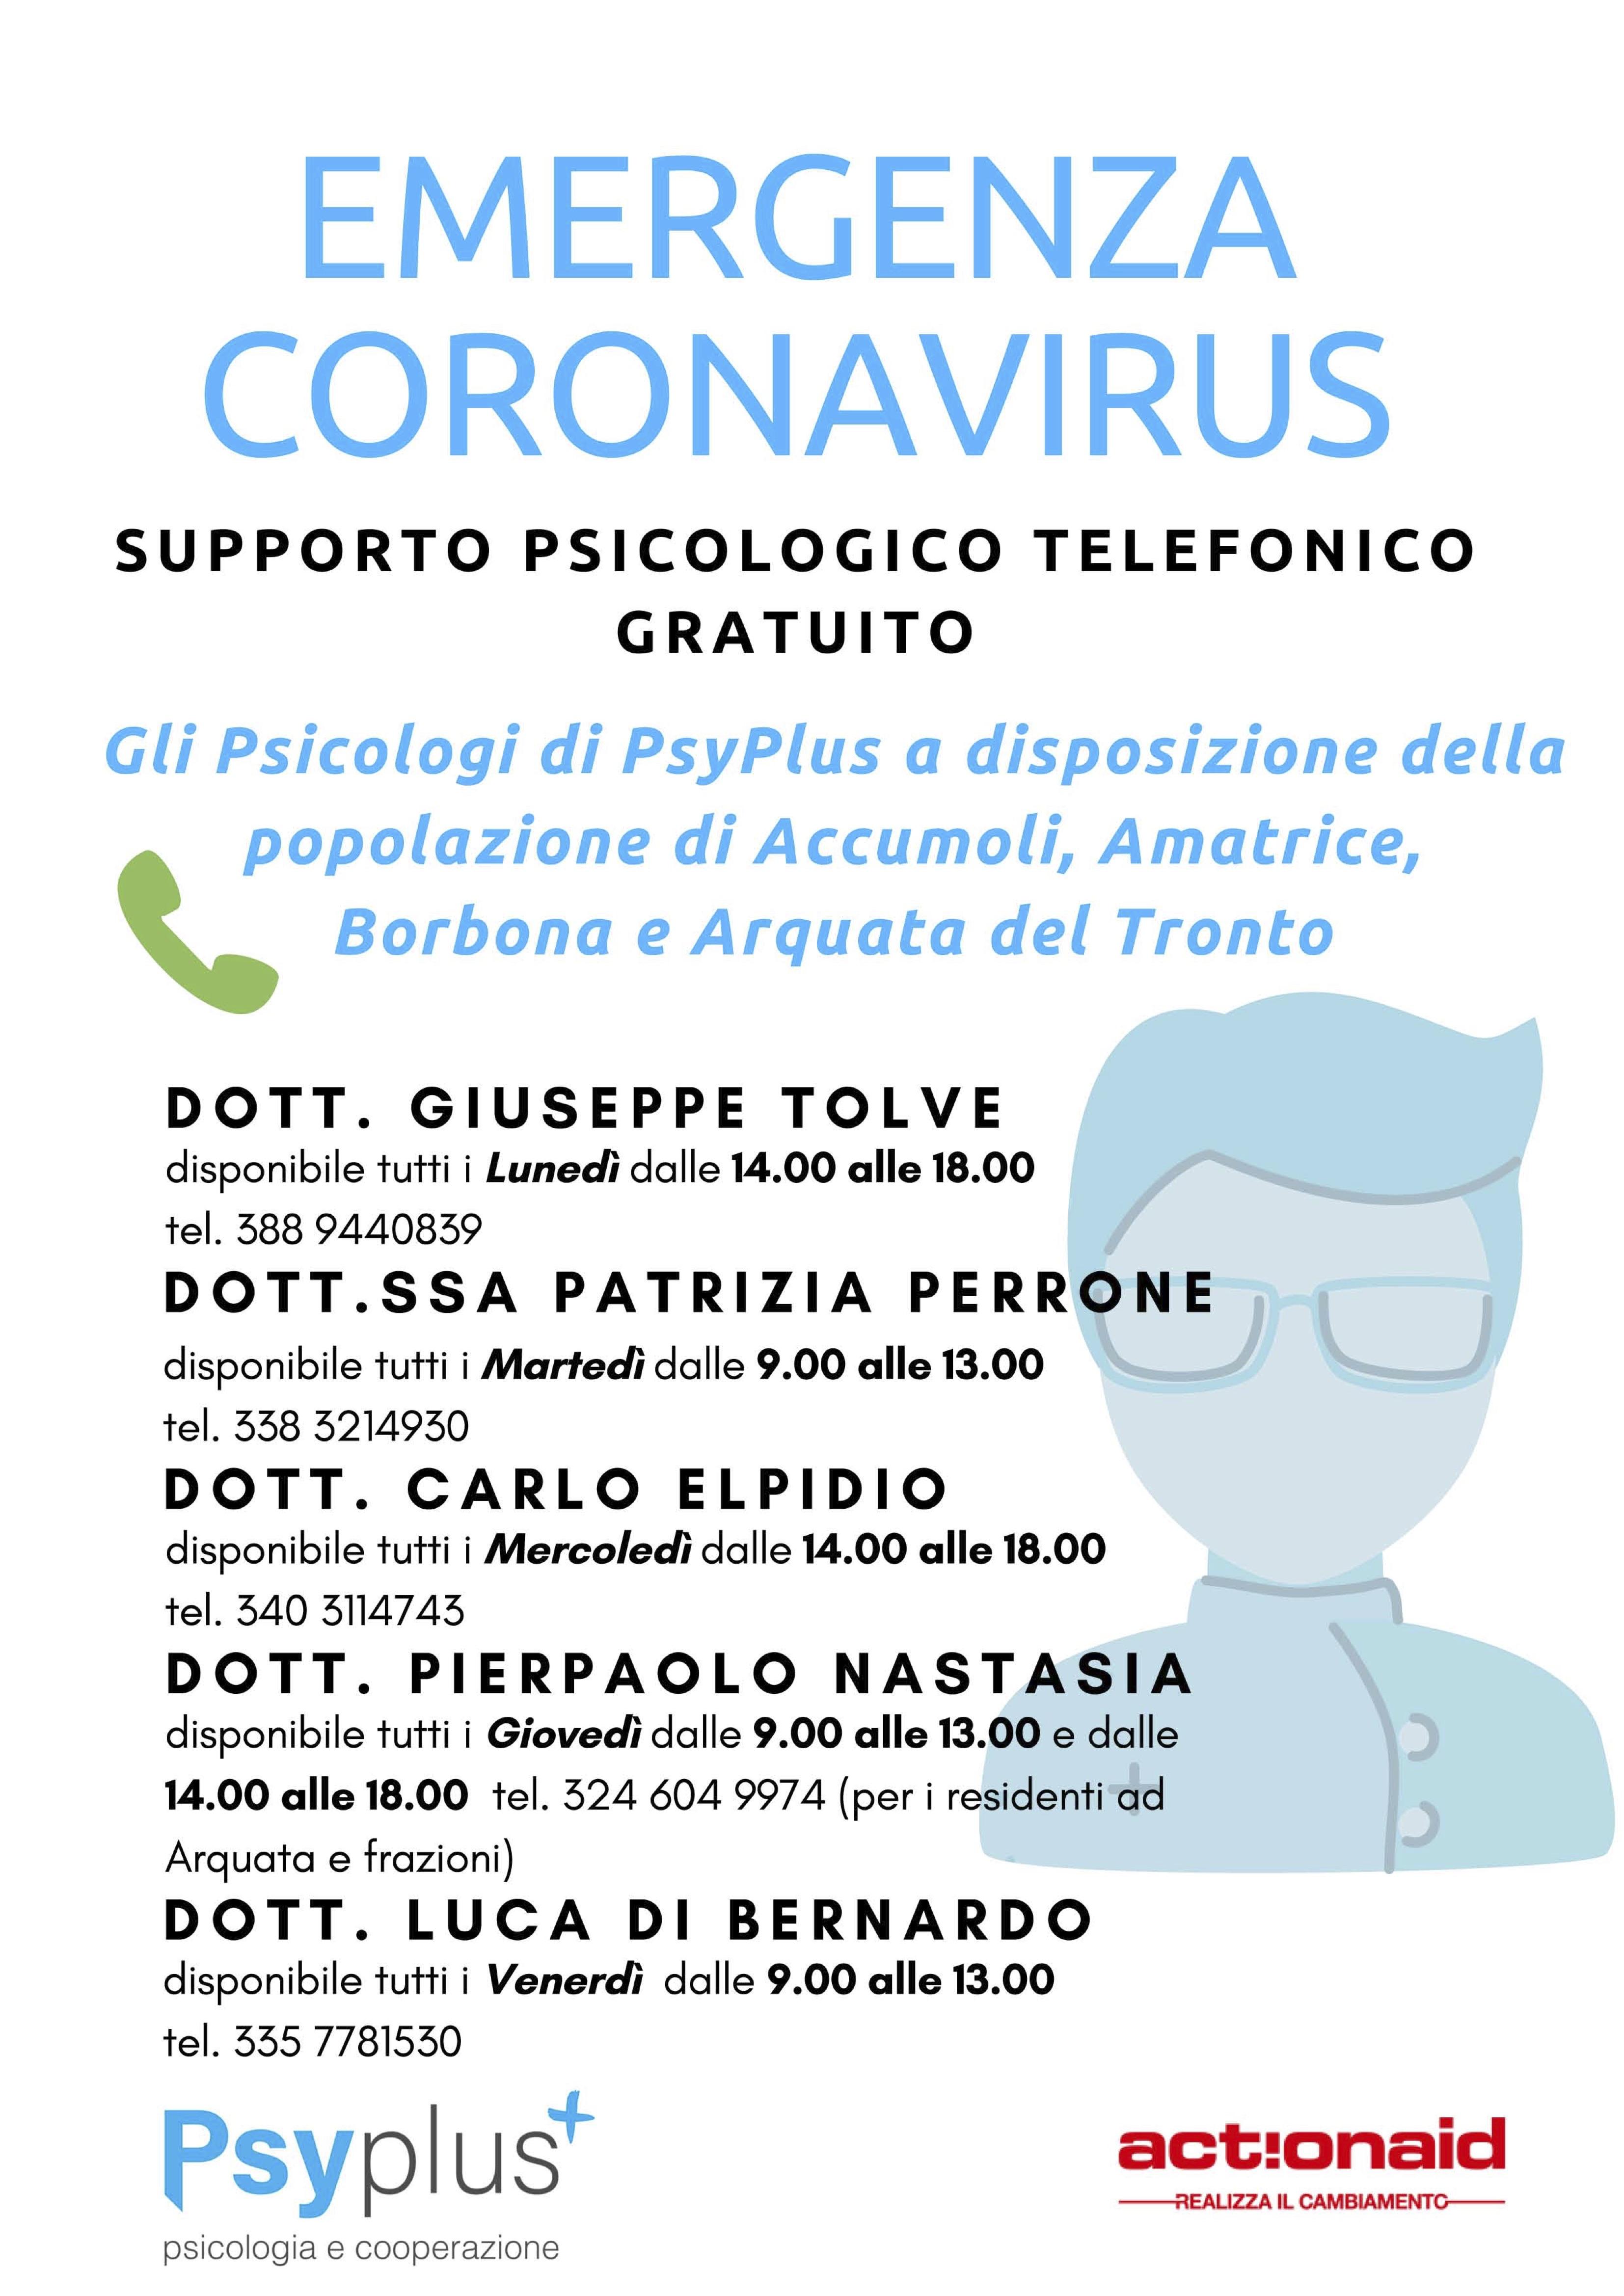 Emergenza Coronavirus PsyPlus-ActioAid (1)